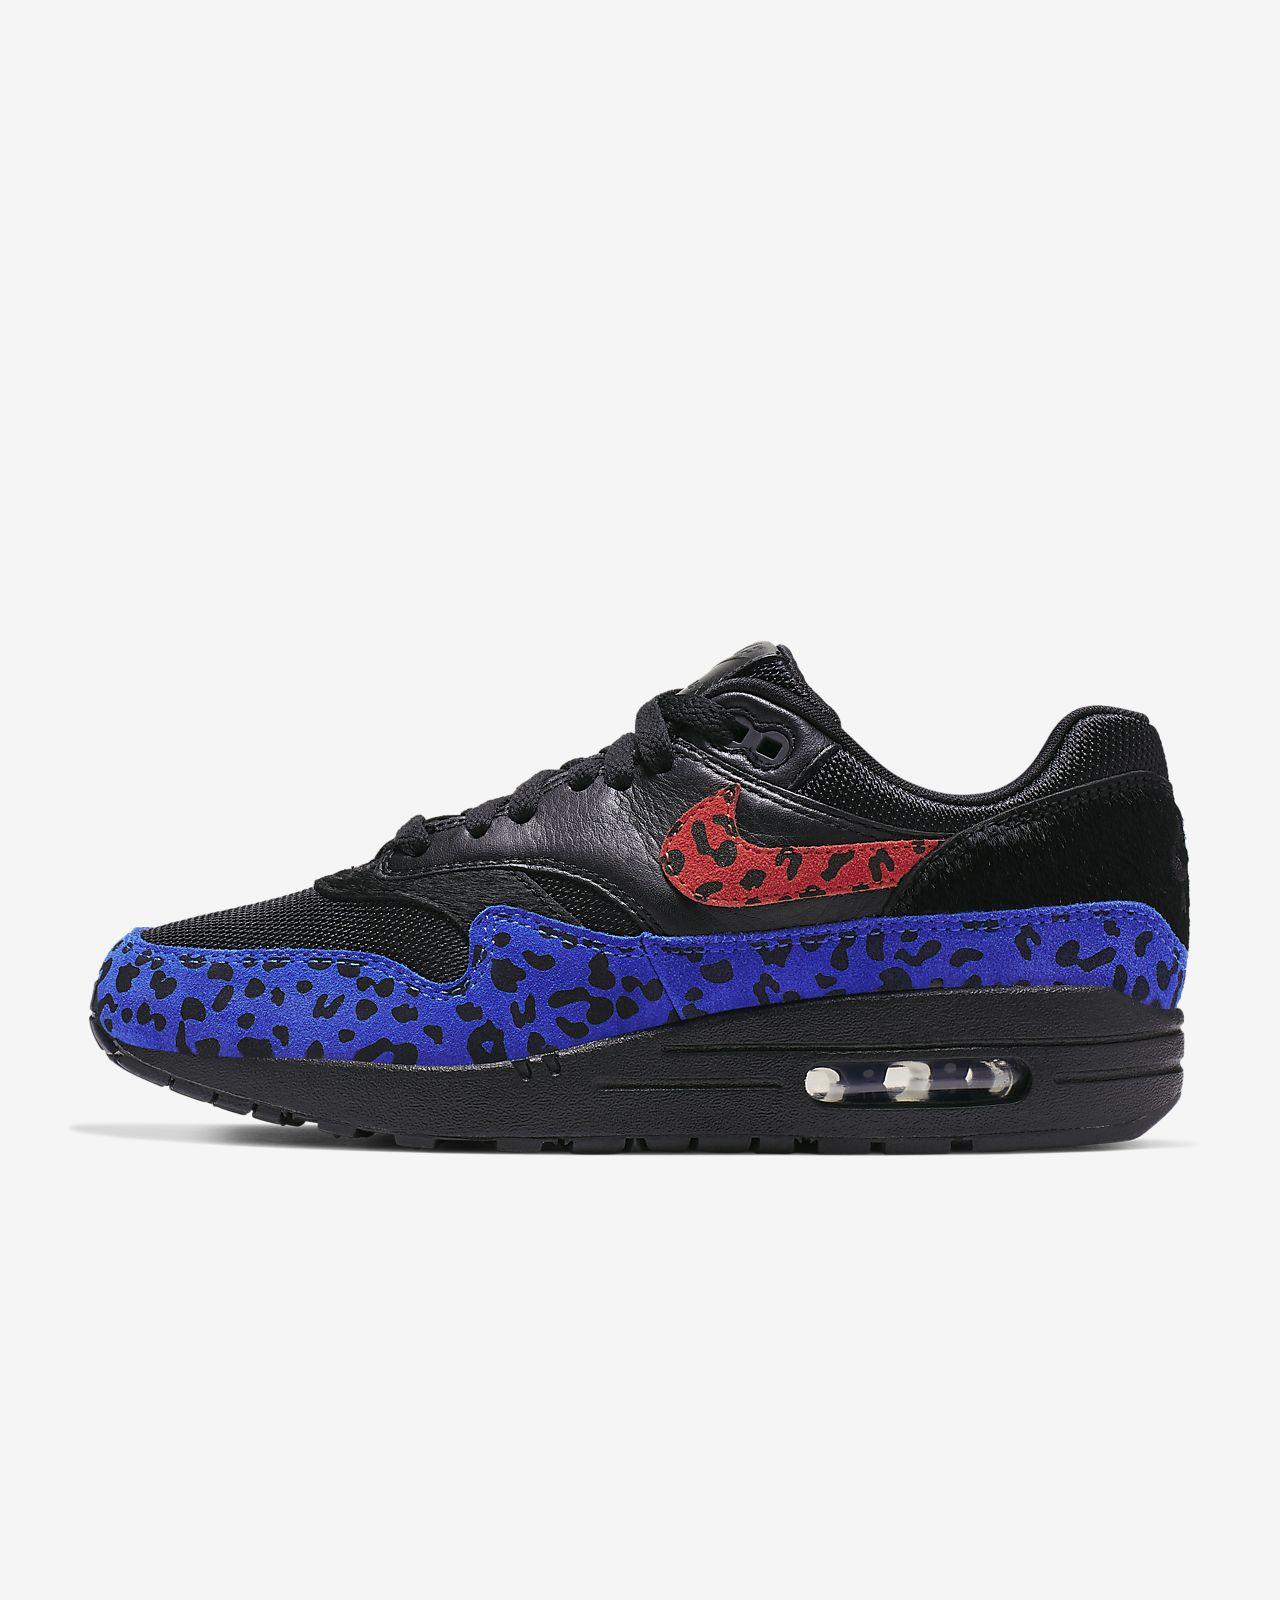 Excellent Nike Running Shorts Leopard Men's Air Max 87 Black